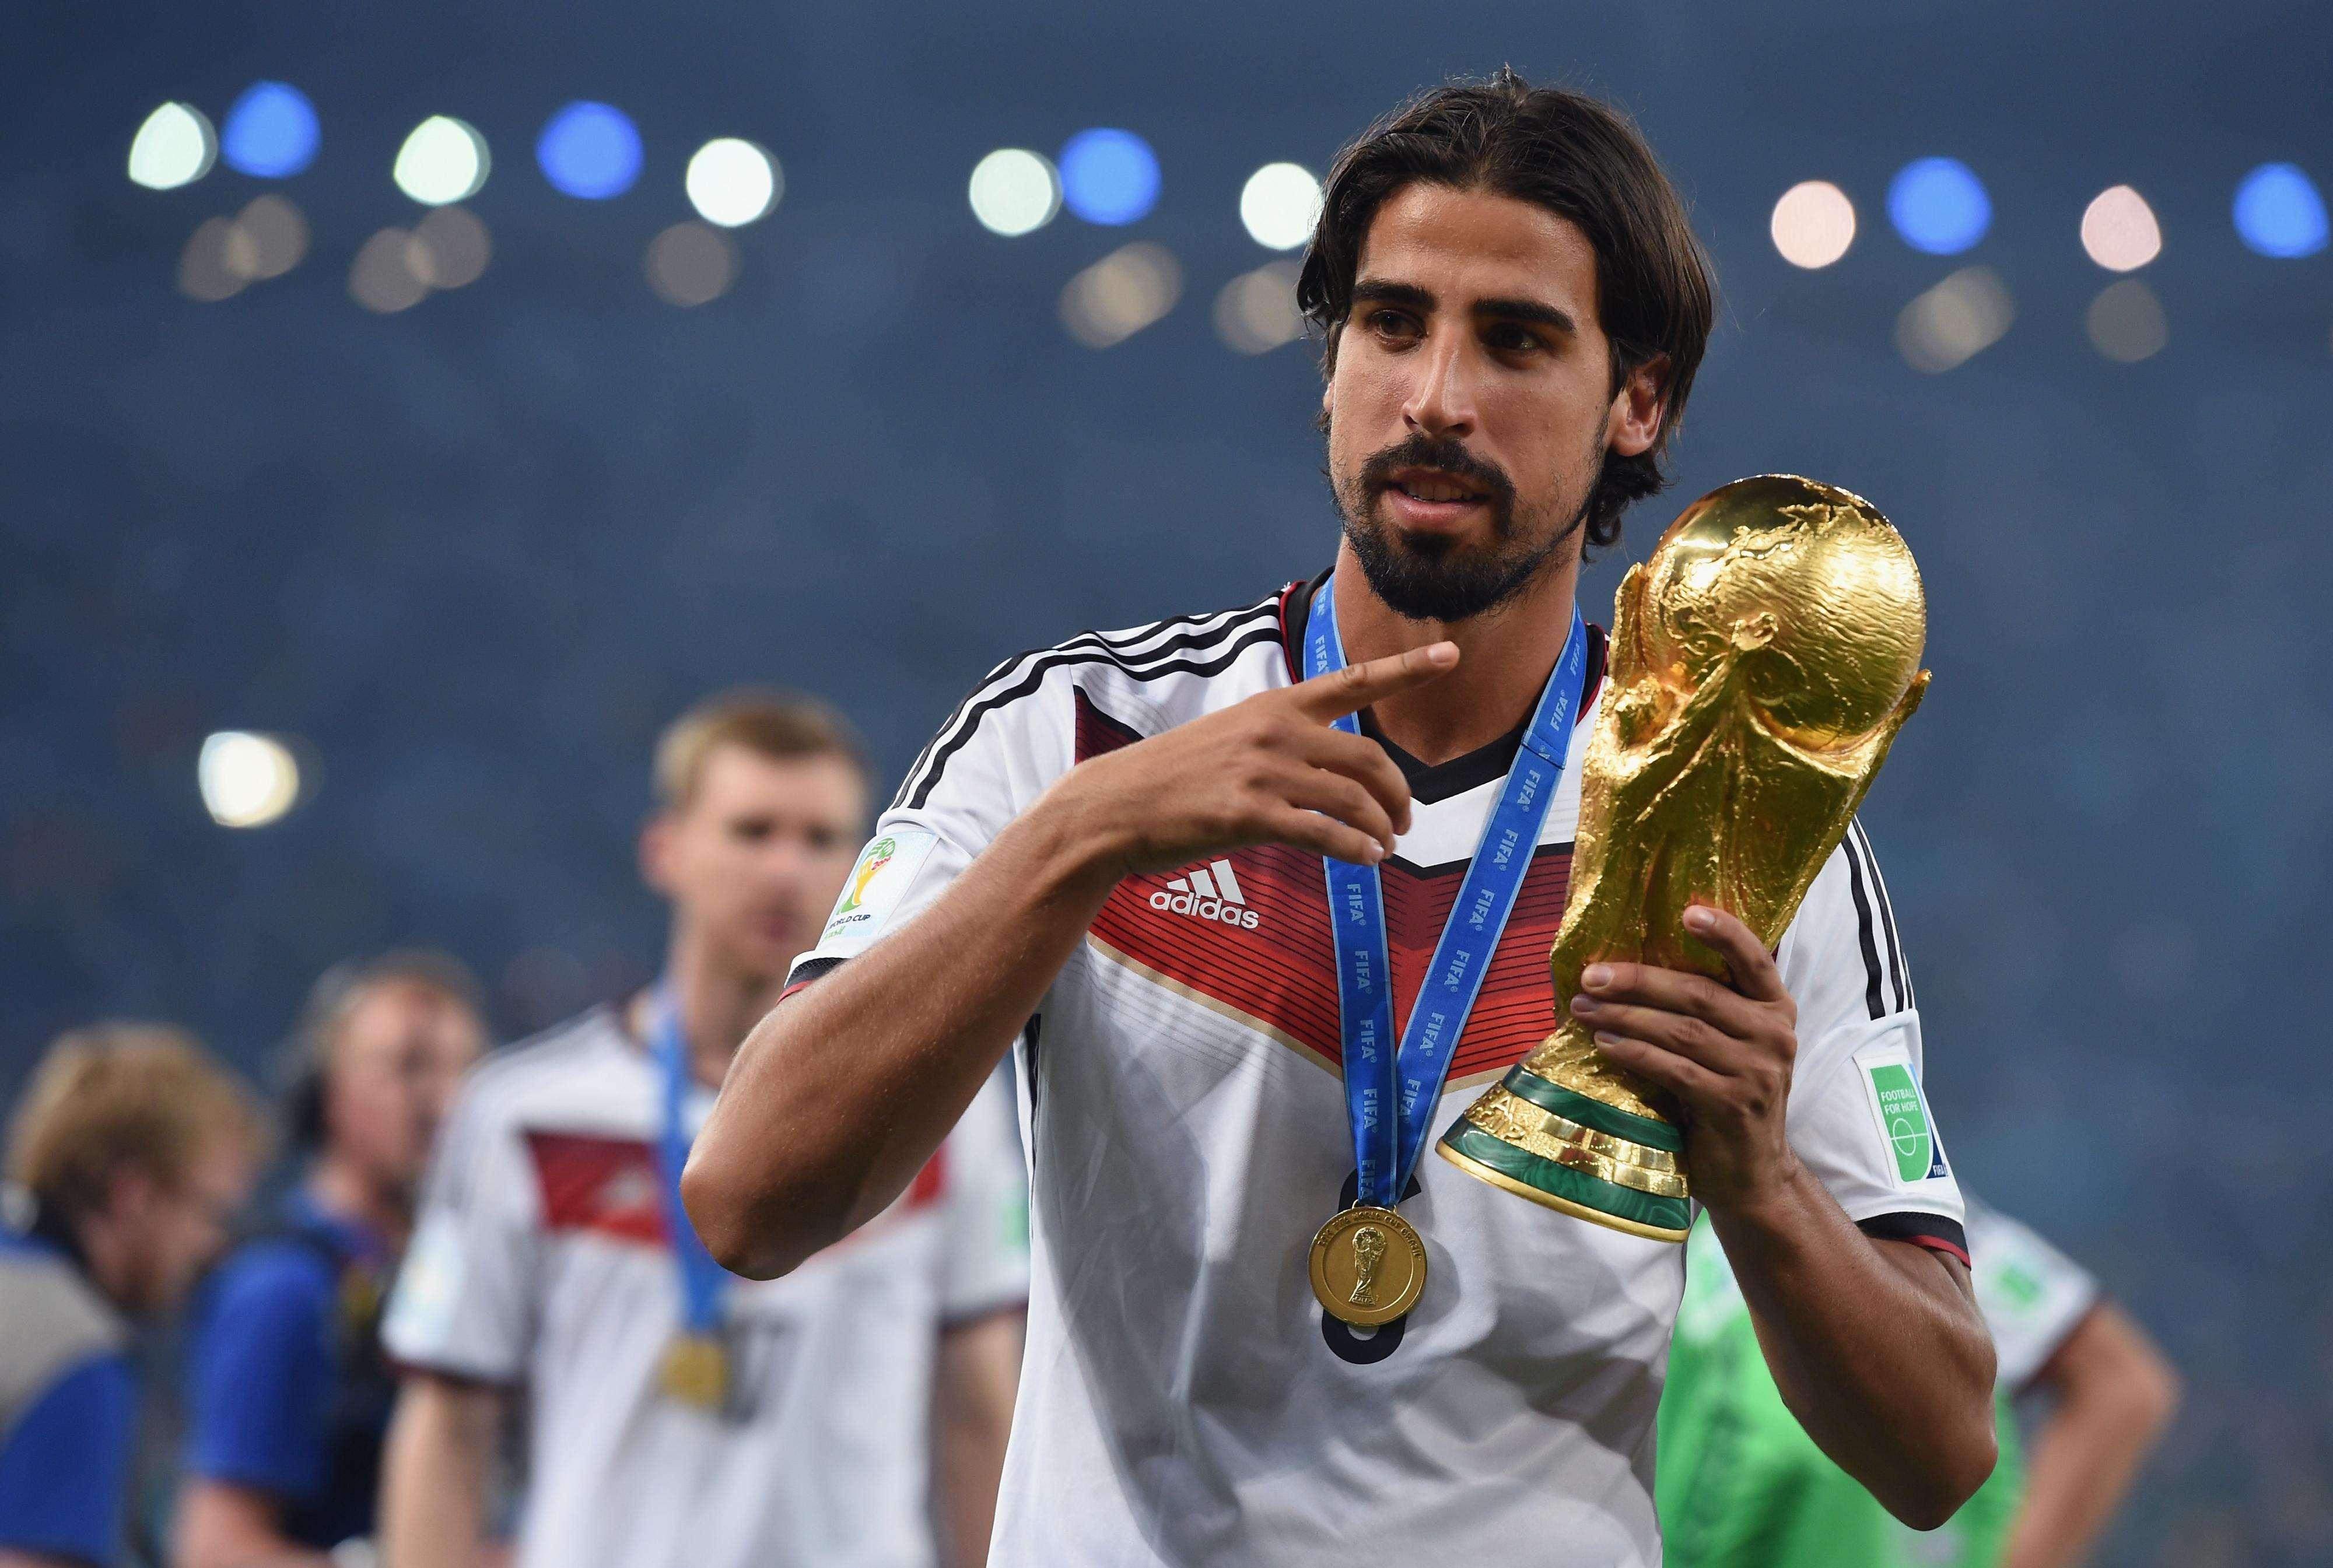 Khedira conquistó el Mundial con Alemania. Foto: Getty Images